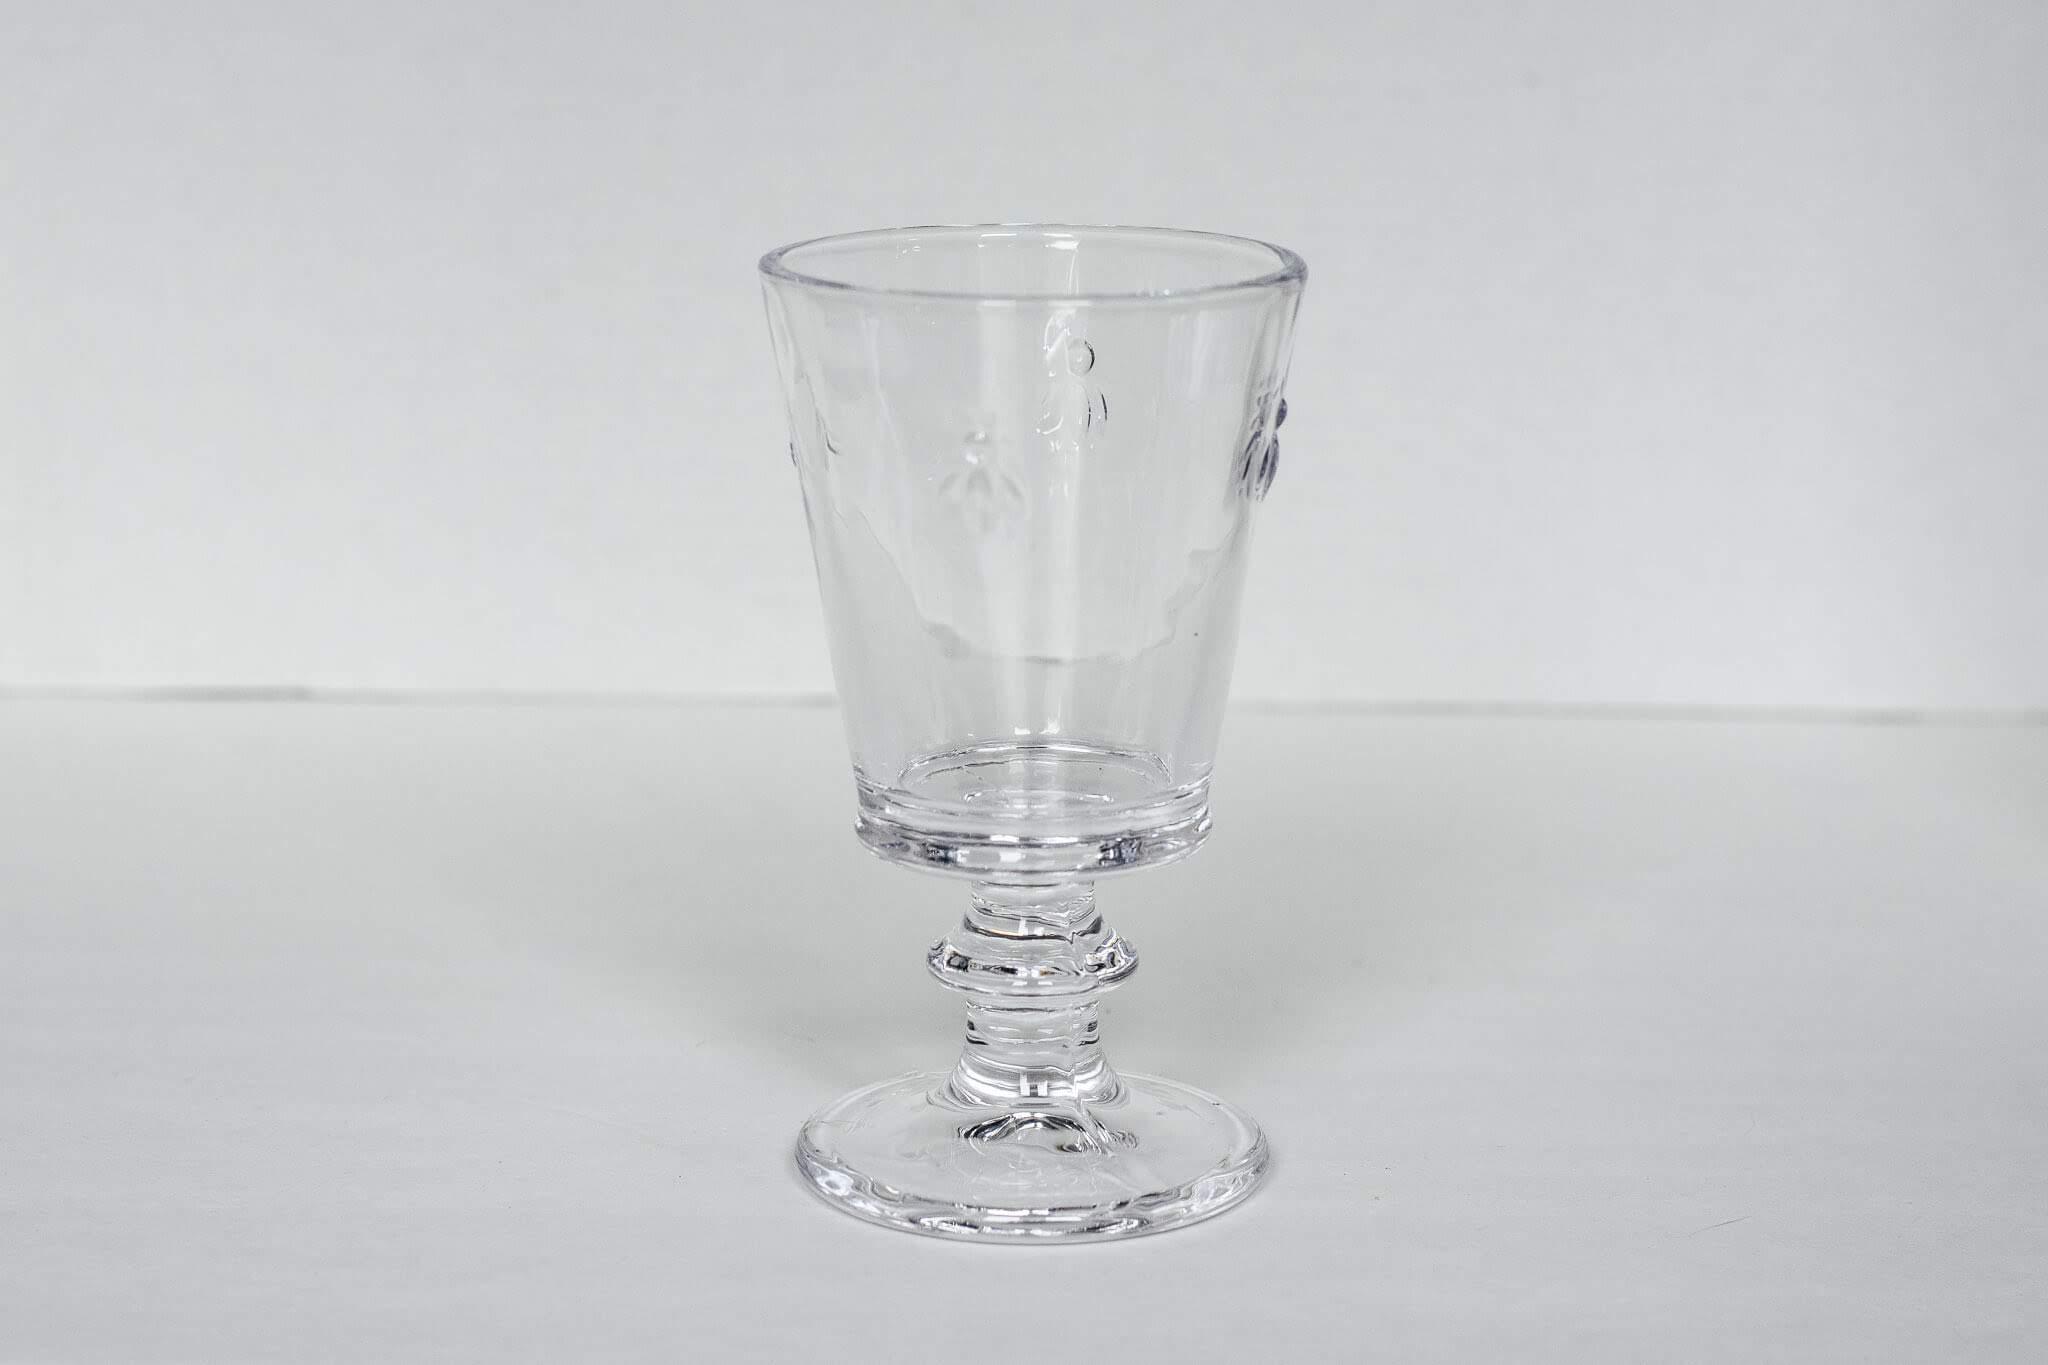 Glassware-39.jpg